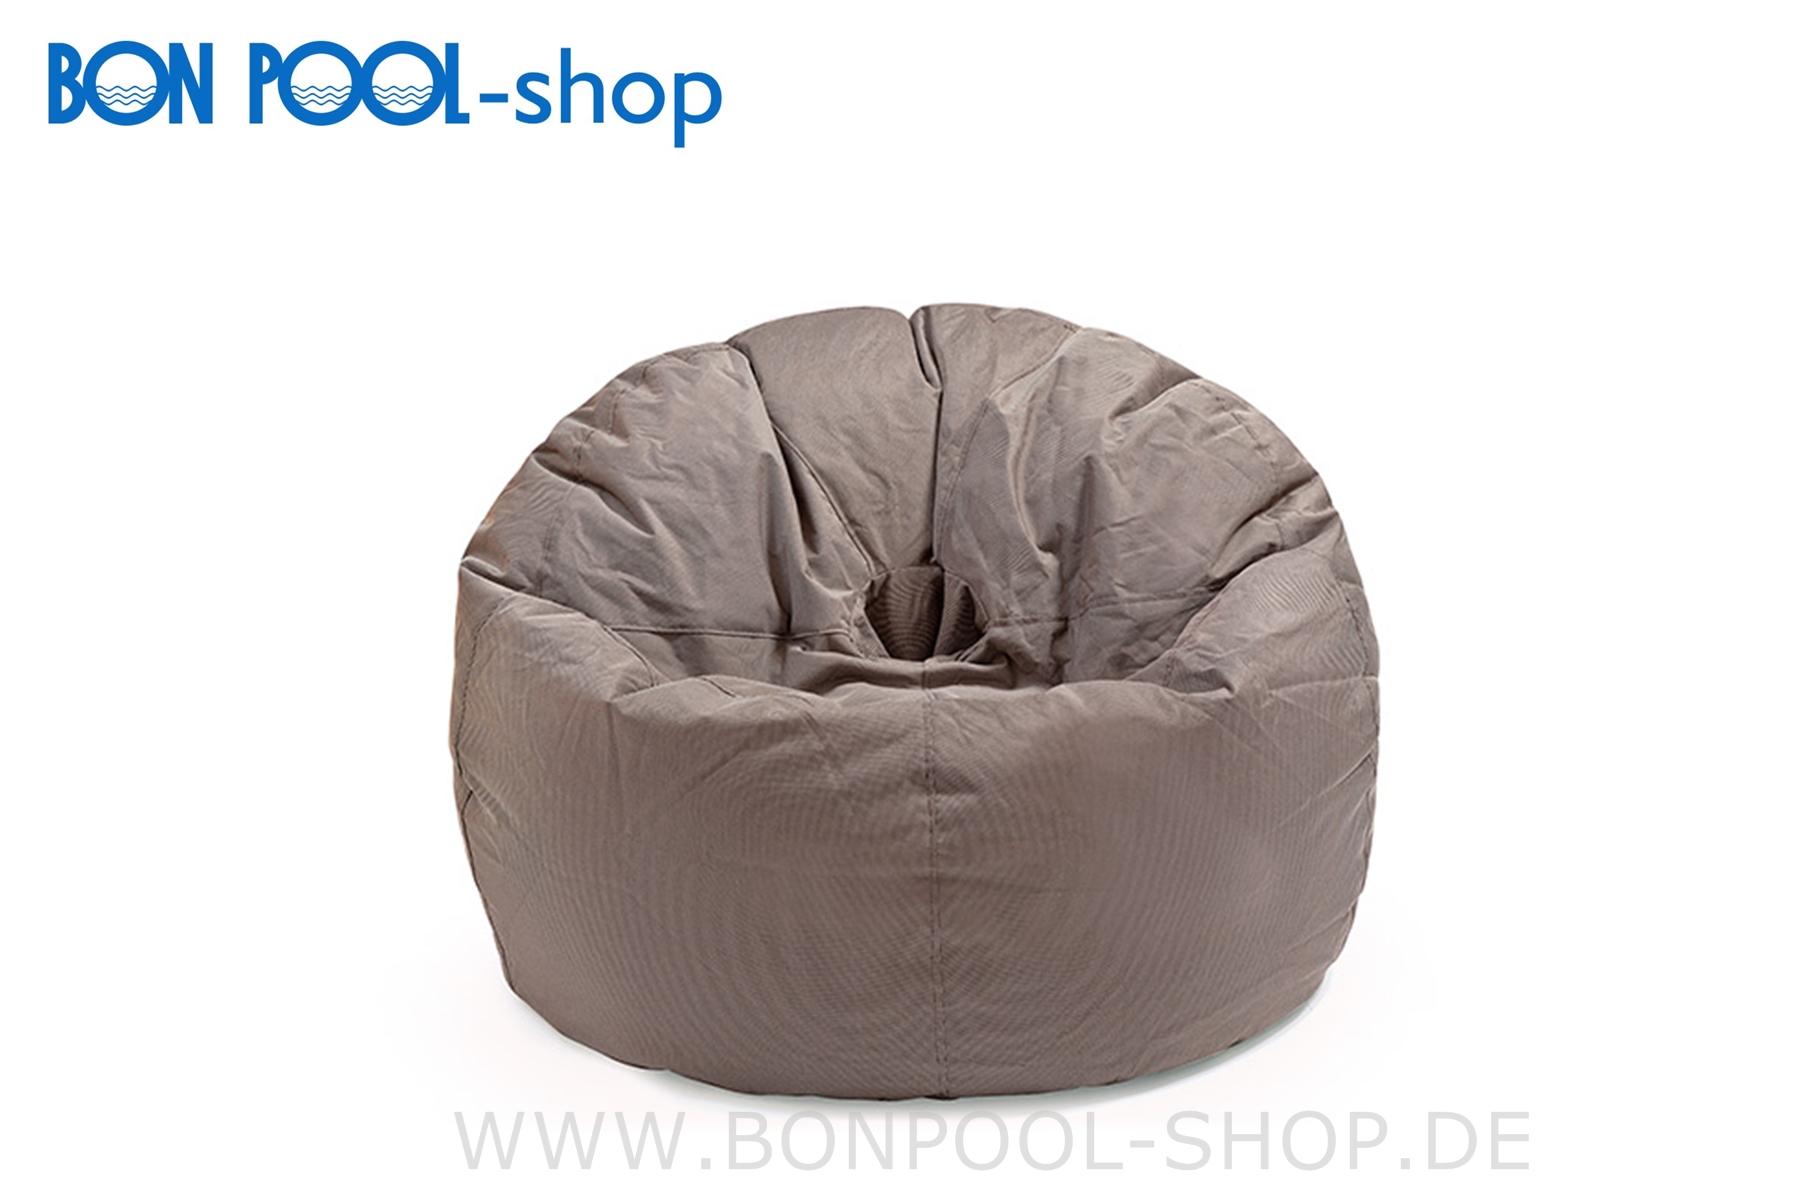 outbag donut cappuccino sitzsack garten bon pool. Black Bedroom Furniture Sets. Home Design Ideas